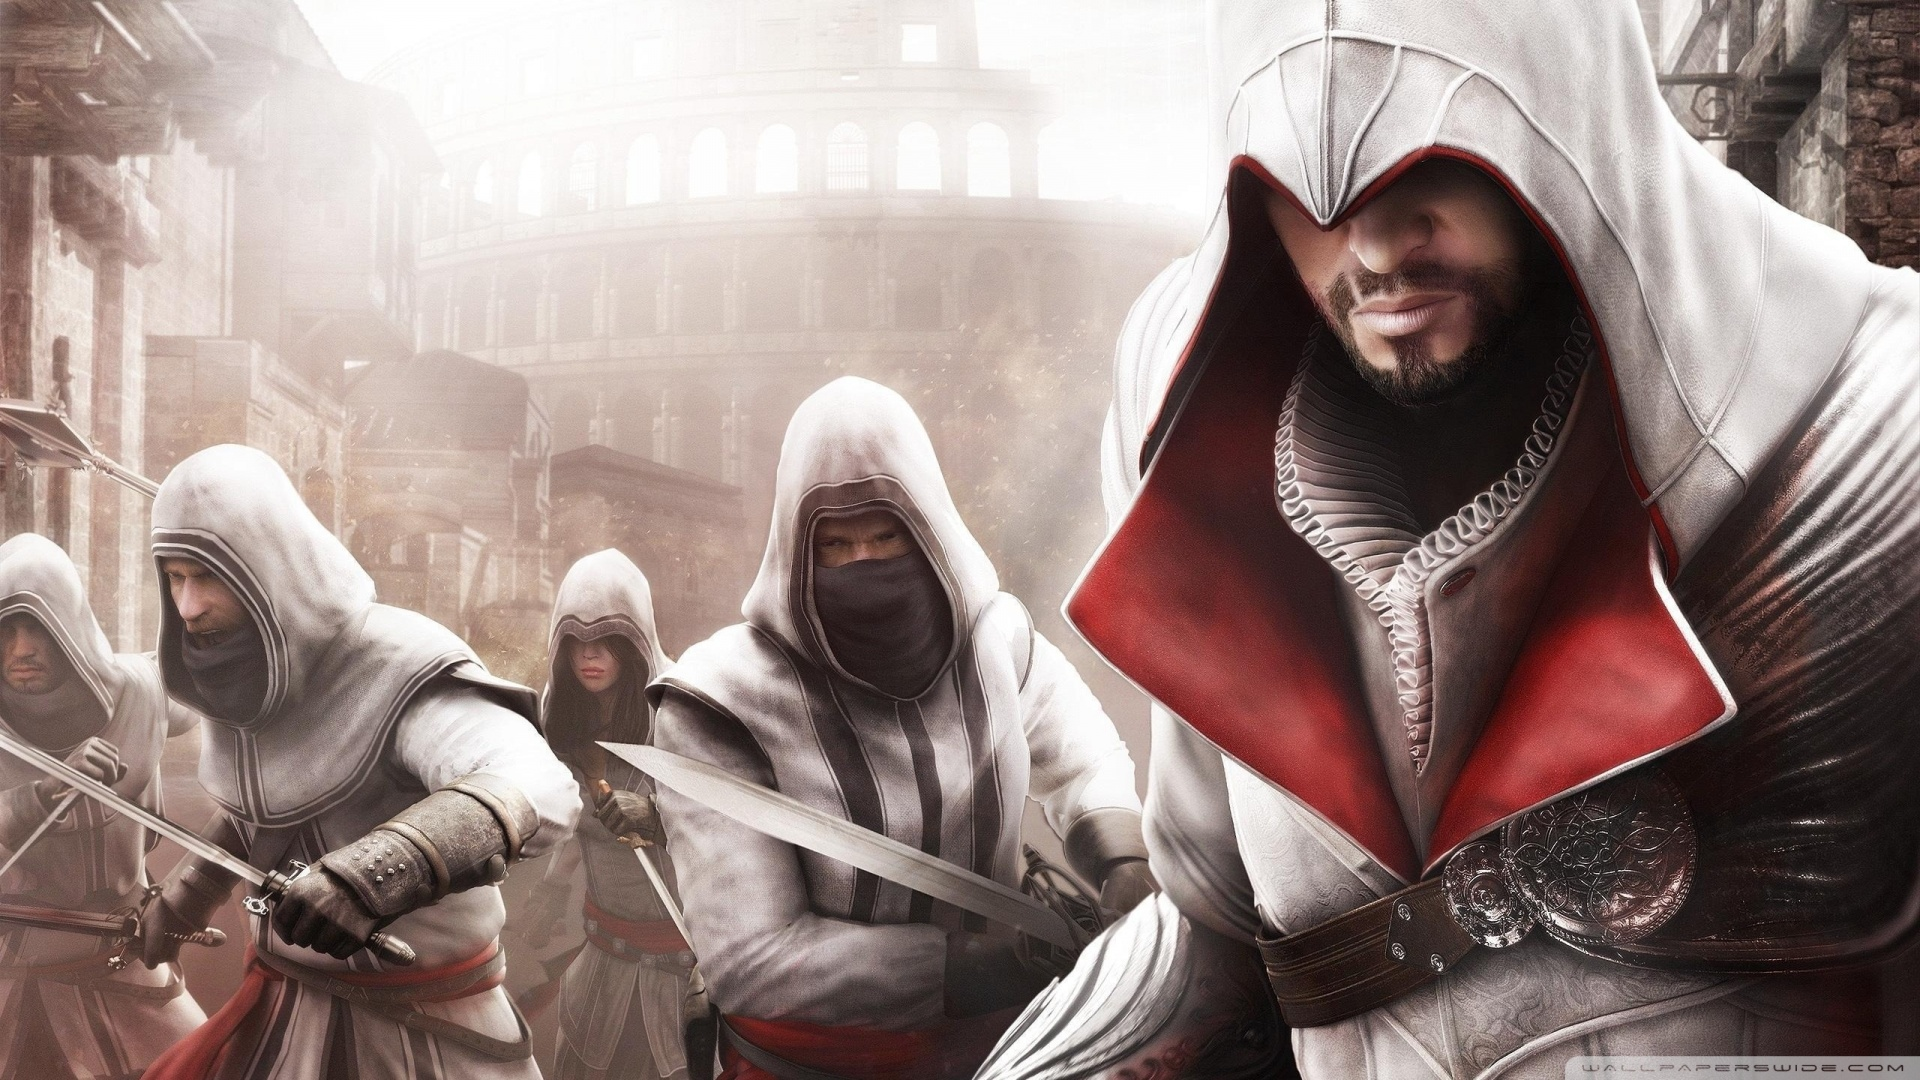 Assassins Creed Brotherhood 13 Wallpaper 1920x1080 Assassins Creed 1920x1080